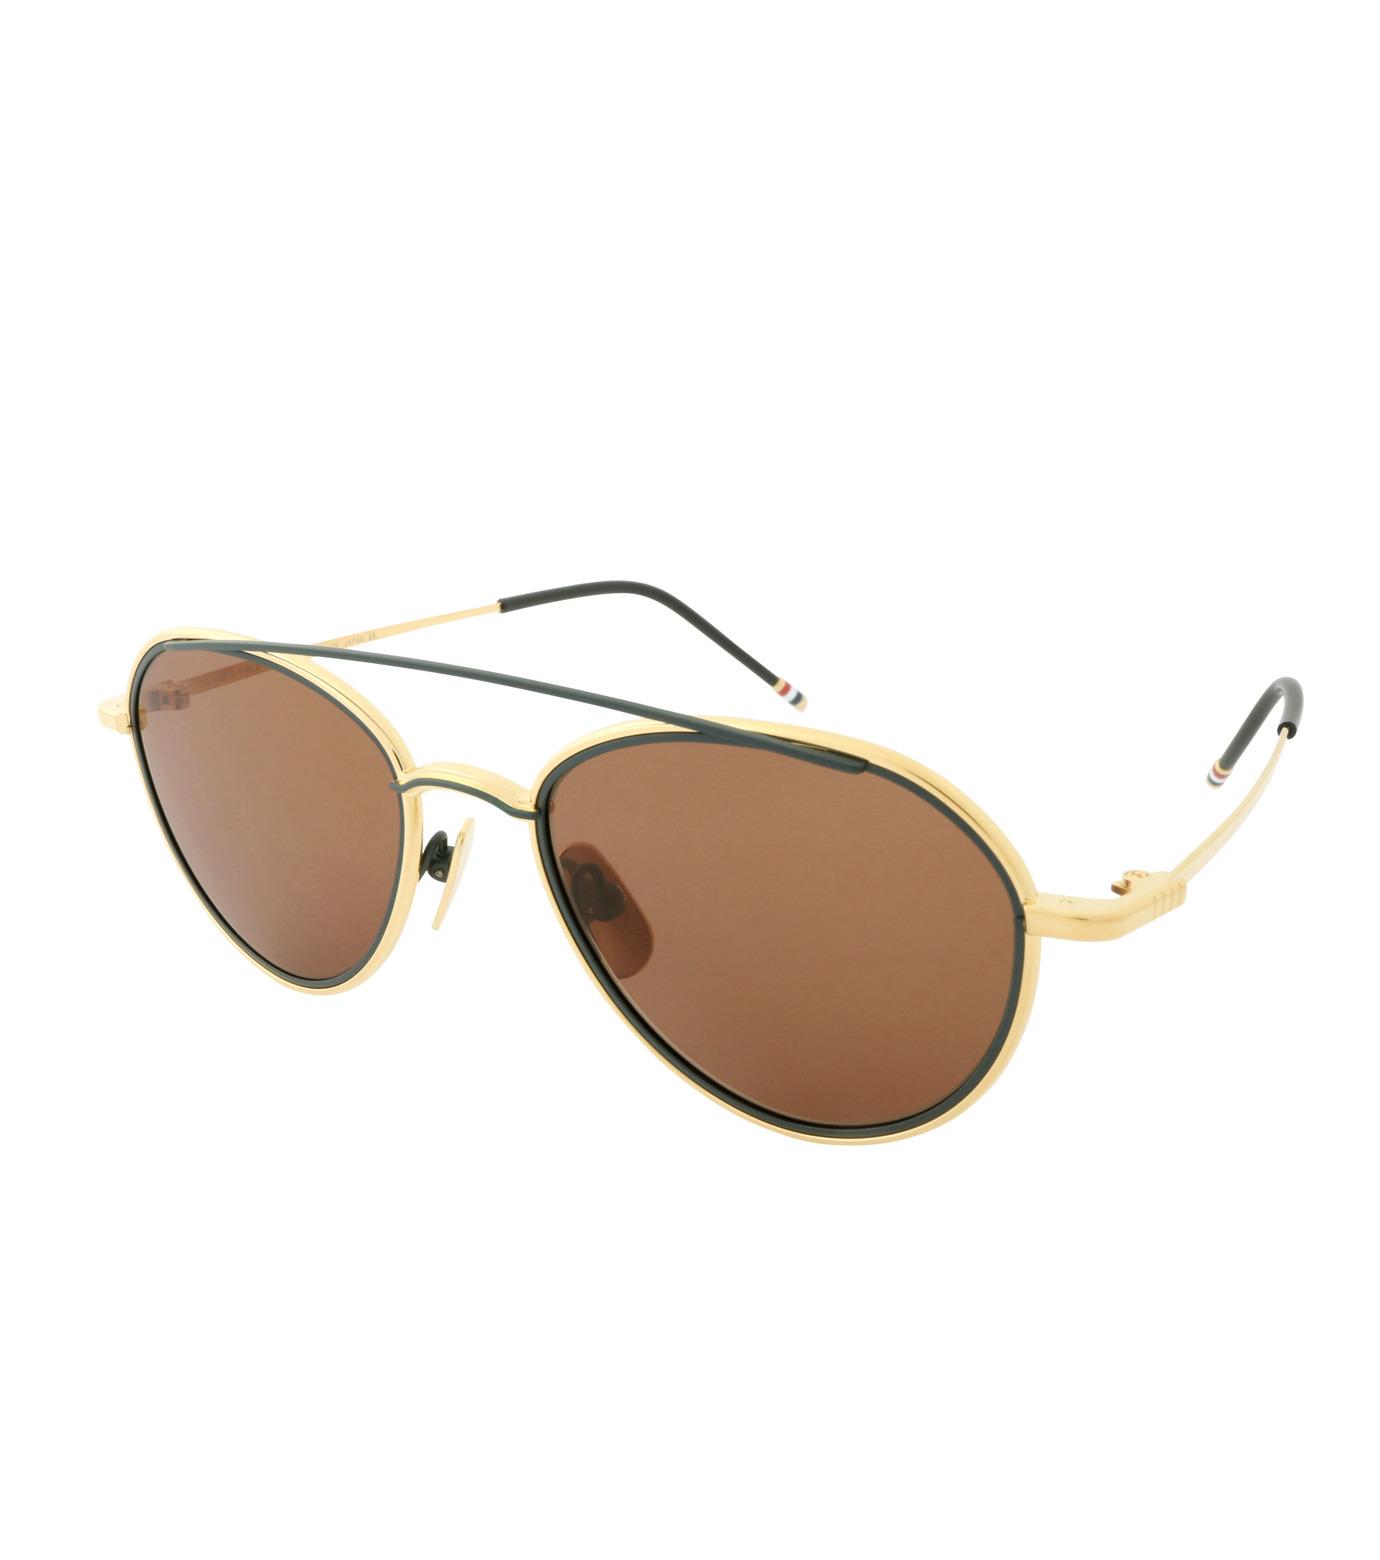 Thom Browne Eye Wear(トム・ブラウン・アイウェア)のGold Frame-SILVER(アイウェア/eyewear)-TB-109-C-T-1 拡大詳細画像1